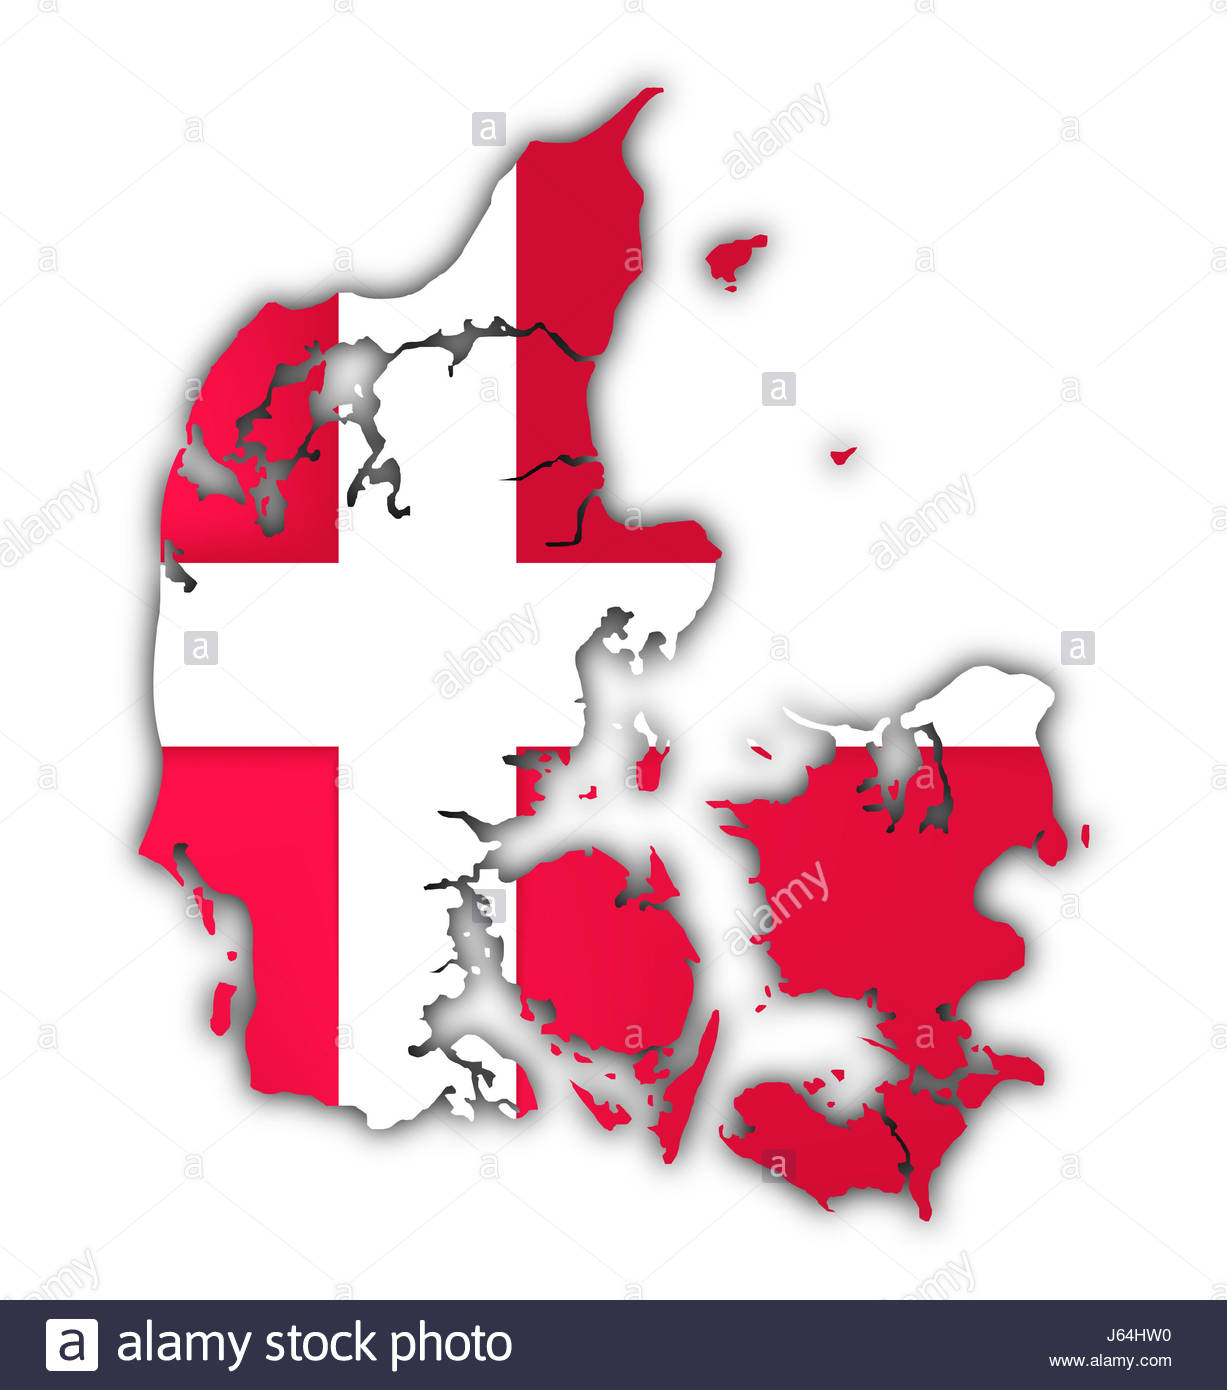 Caucase Europe Européenne Vierge Danemark Copenhague Drapeau serapportantà Union Européenne Carte Vierge